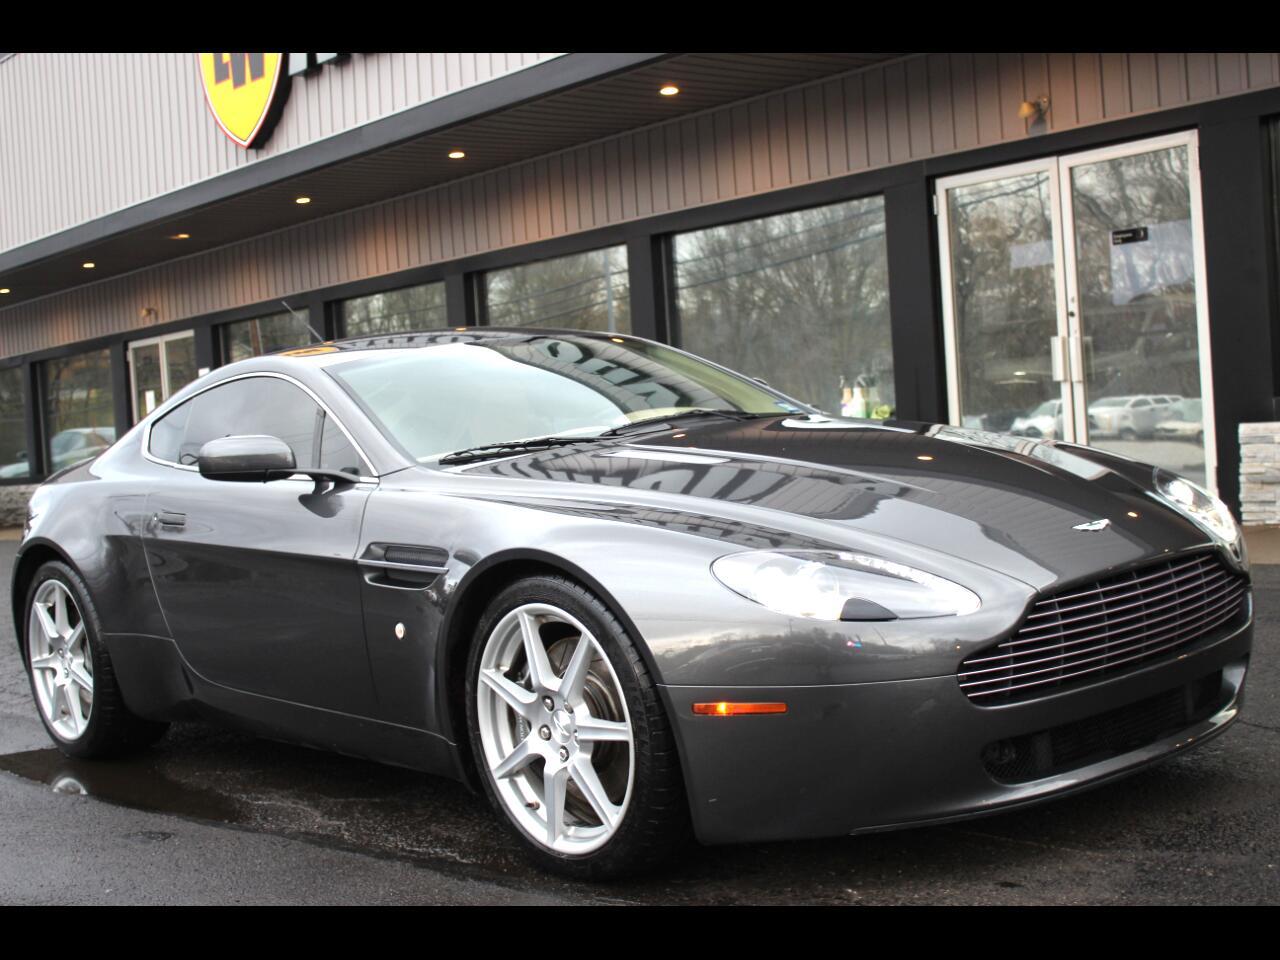 2006 Aston Martin V8 Vantage Coupe